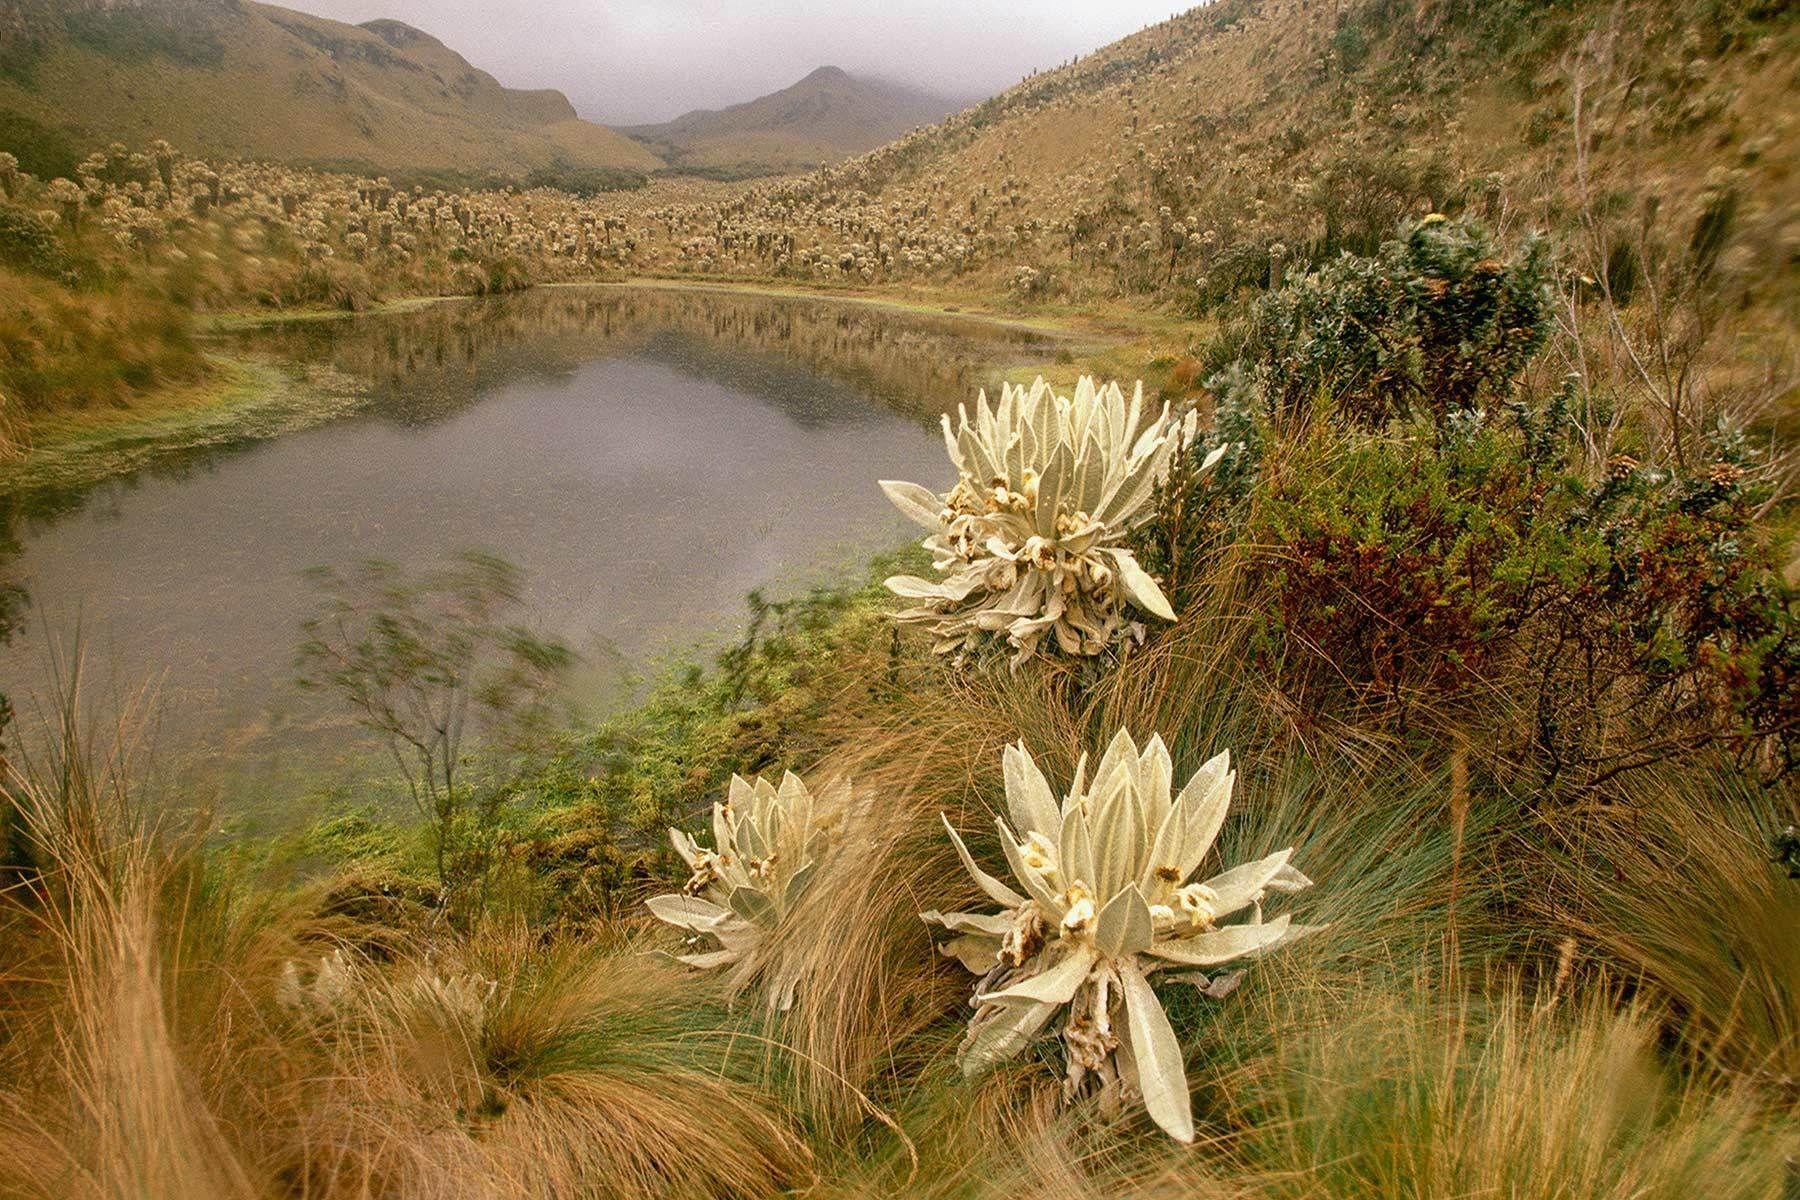 Andean Paramo landscape